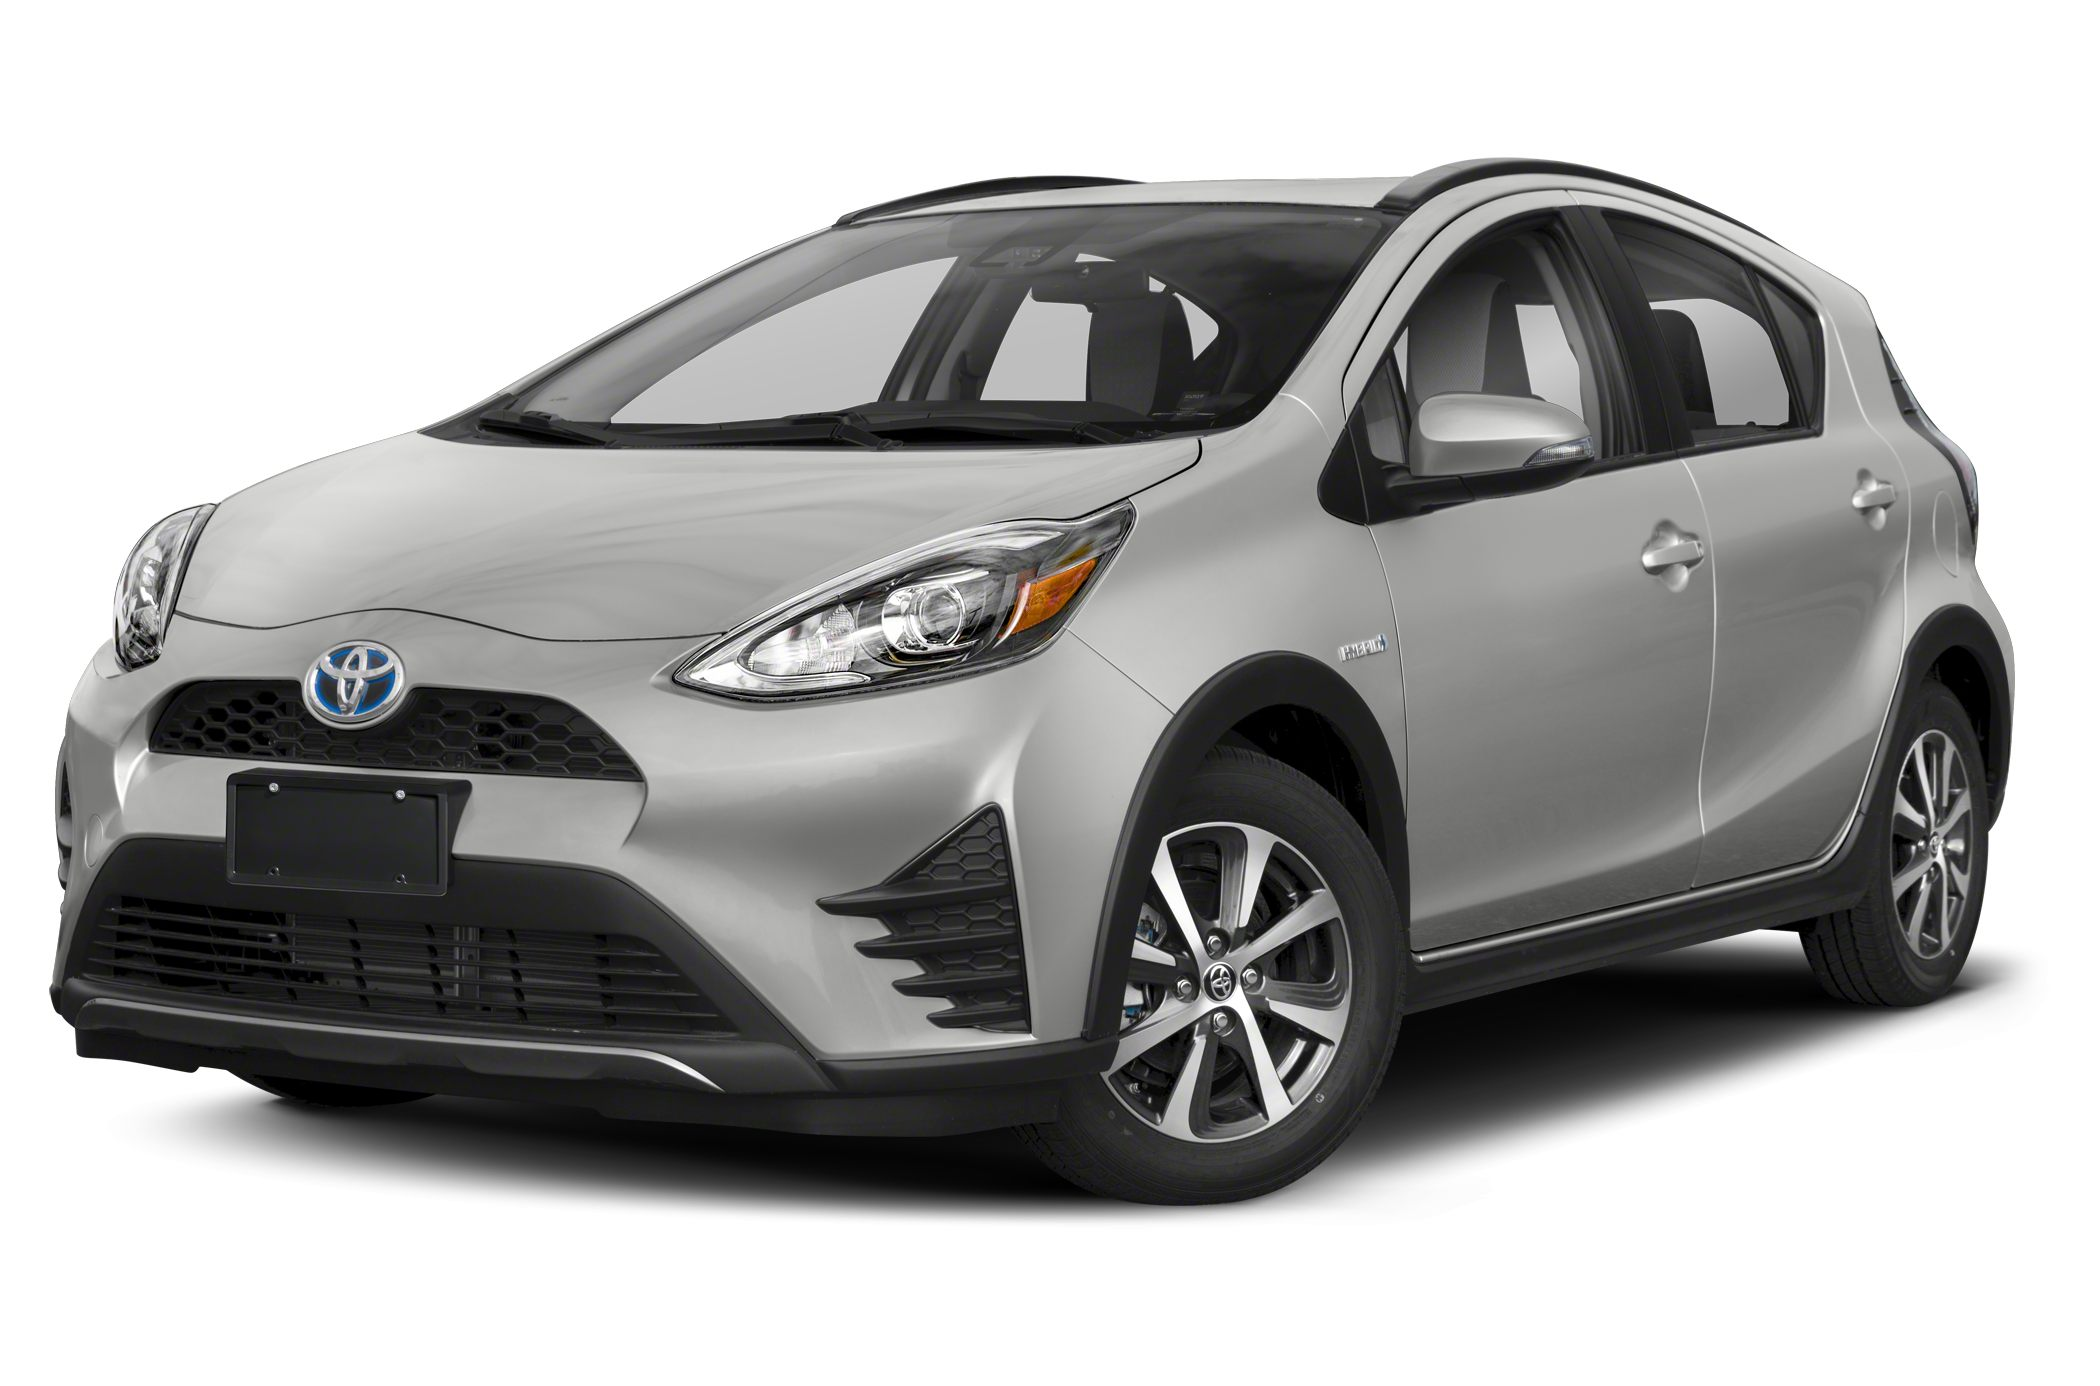 2018 Toyota Prius C Pricing And Specs